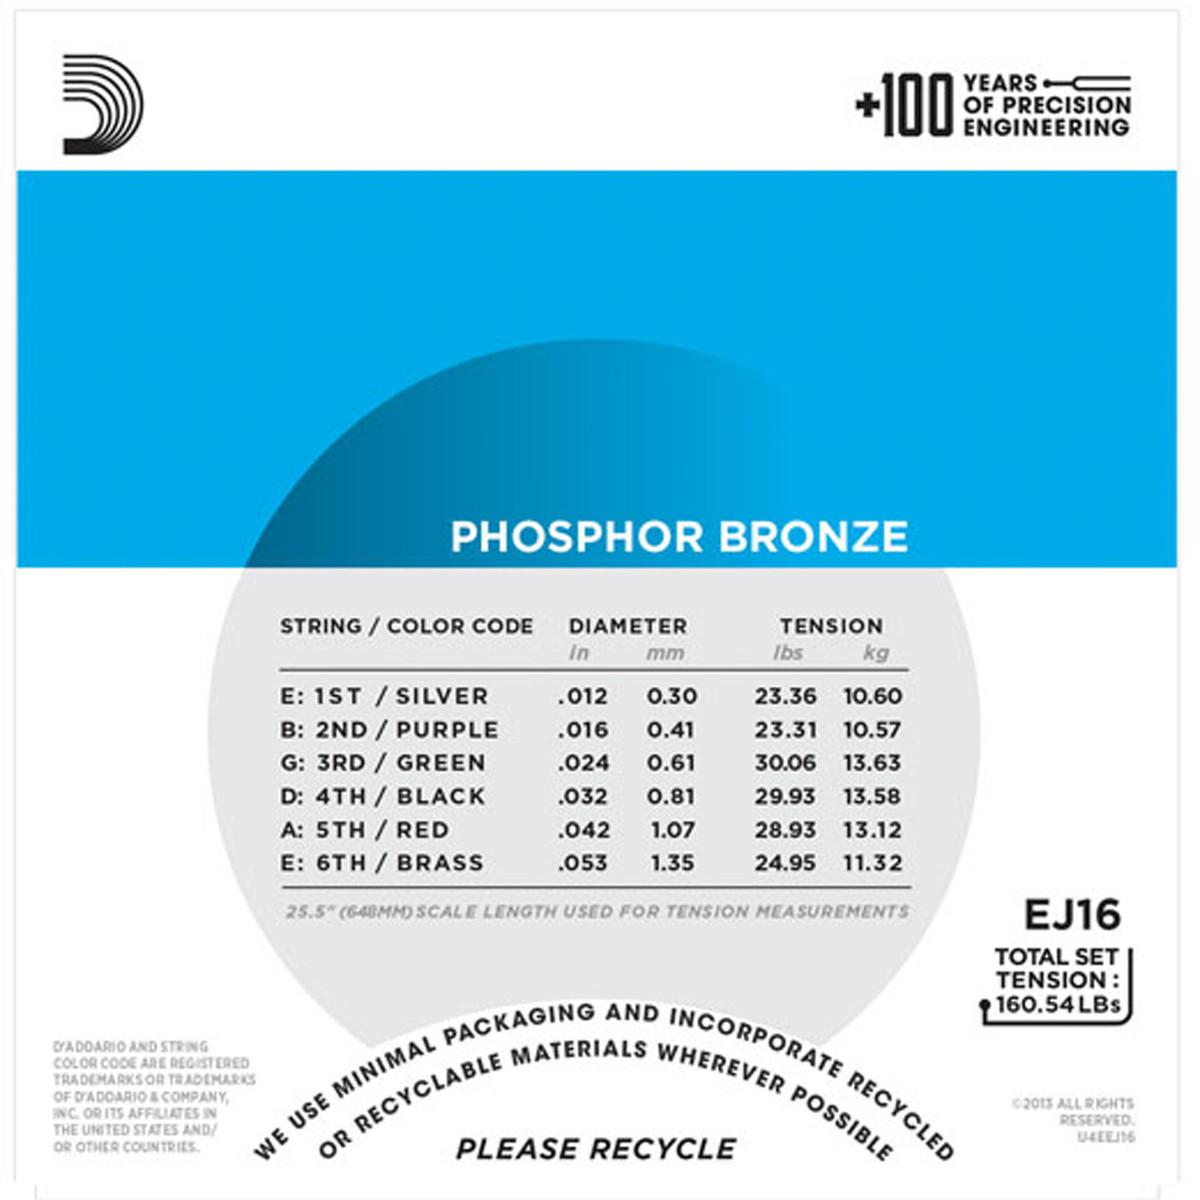 D'Addario EJ16 Phosphor Bronze, Light, 12-53 at Gear4music.ie